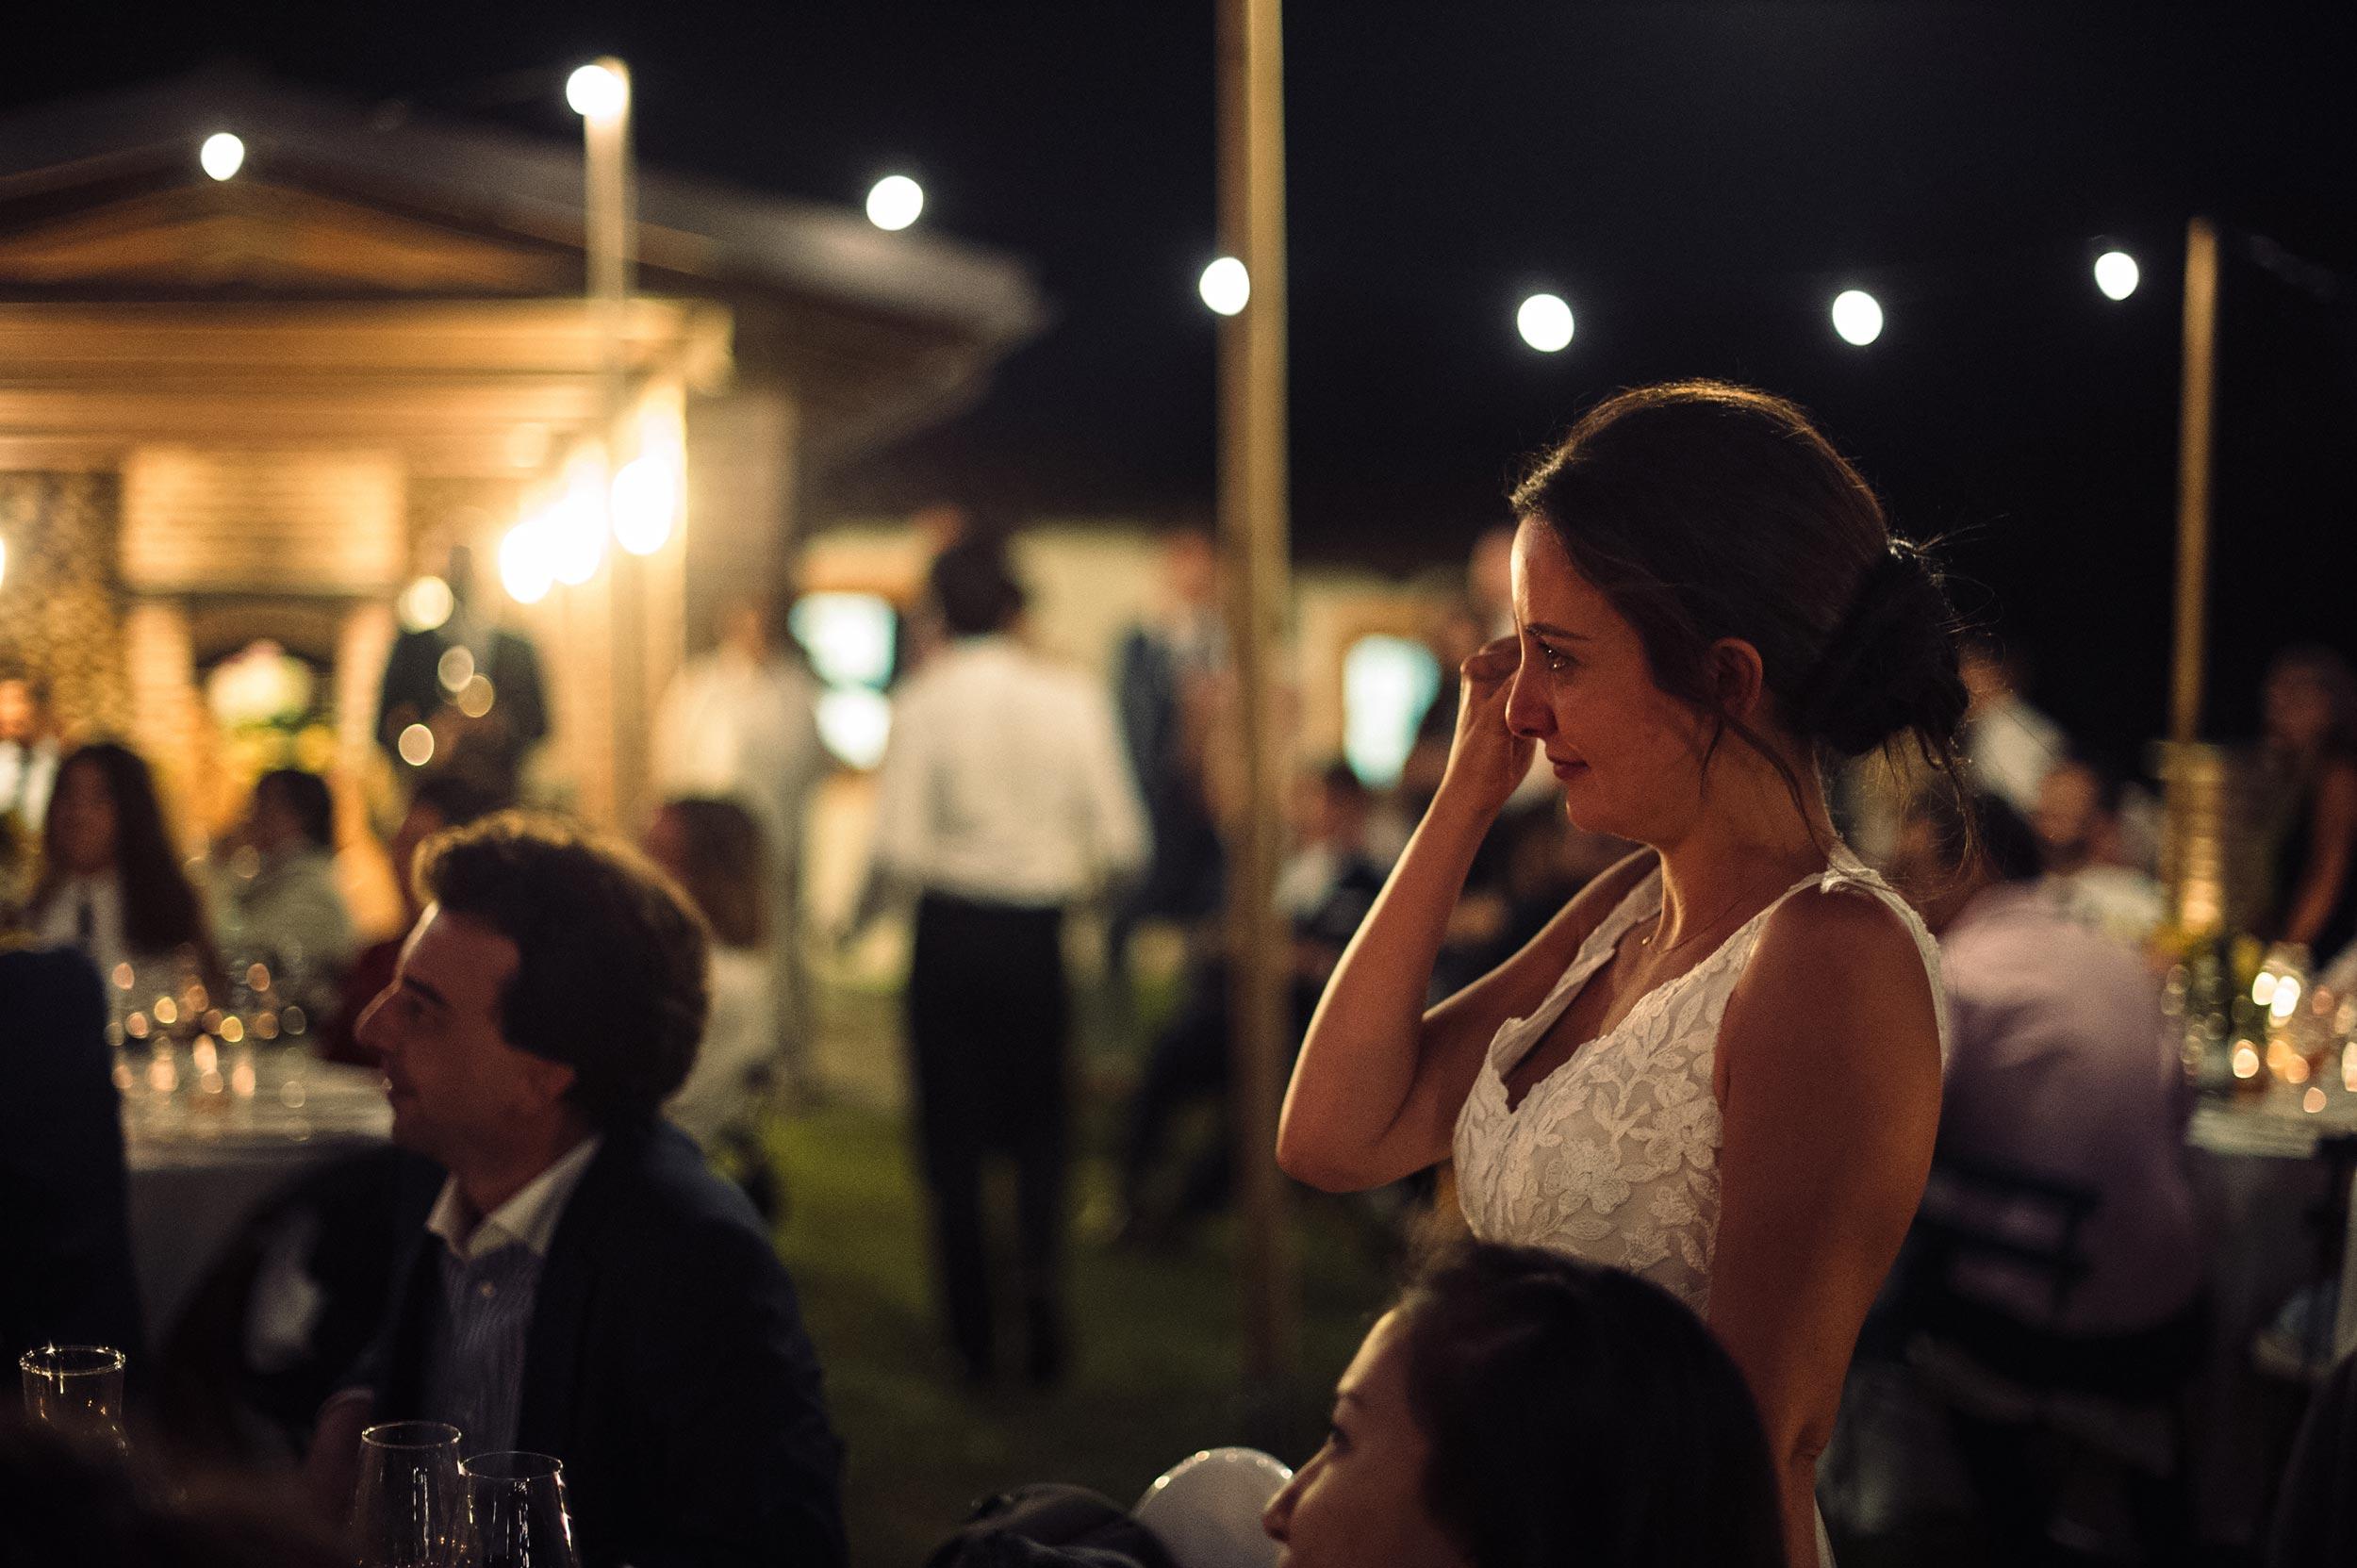 2016-Davor-Chiara-Monferrato-Asti-Vercelli-Wedding-Photographer-Italy-Alessandro-Avenali-79.jpg